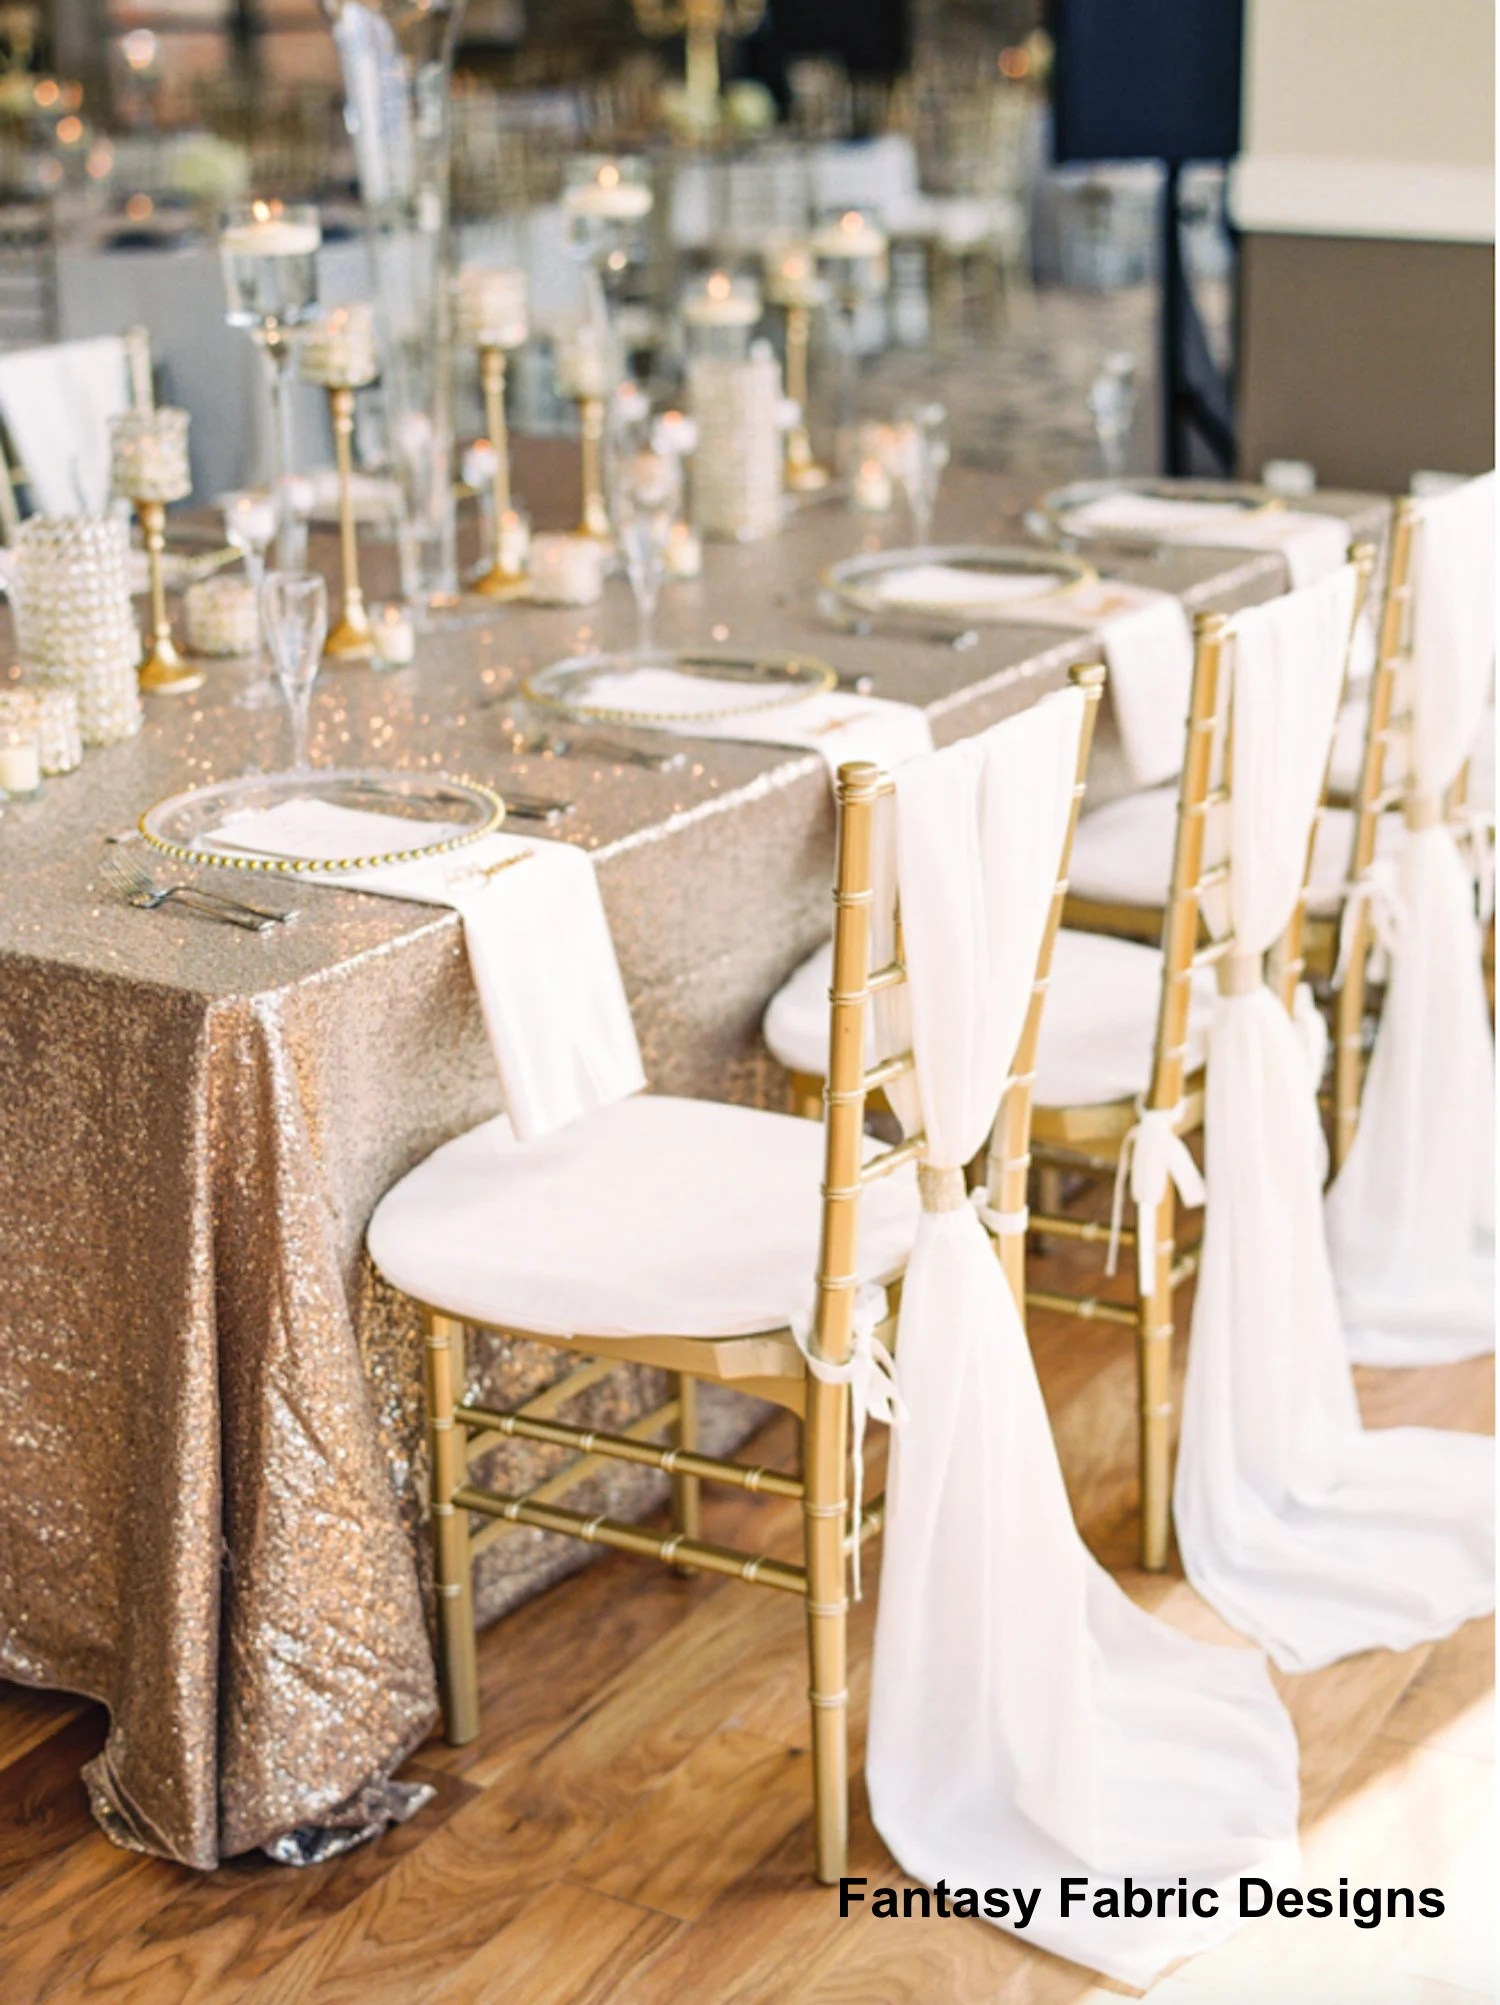 chair back covers wedding wooden garden chiavari cover etsy cushion decor bridal baby shower